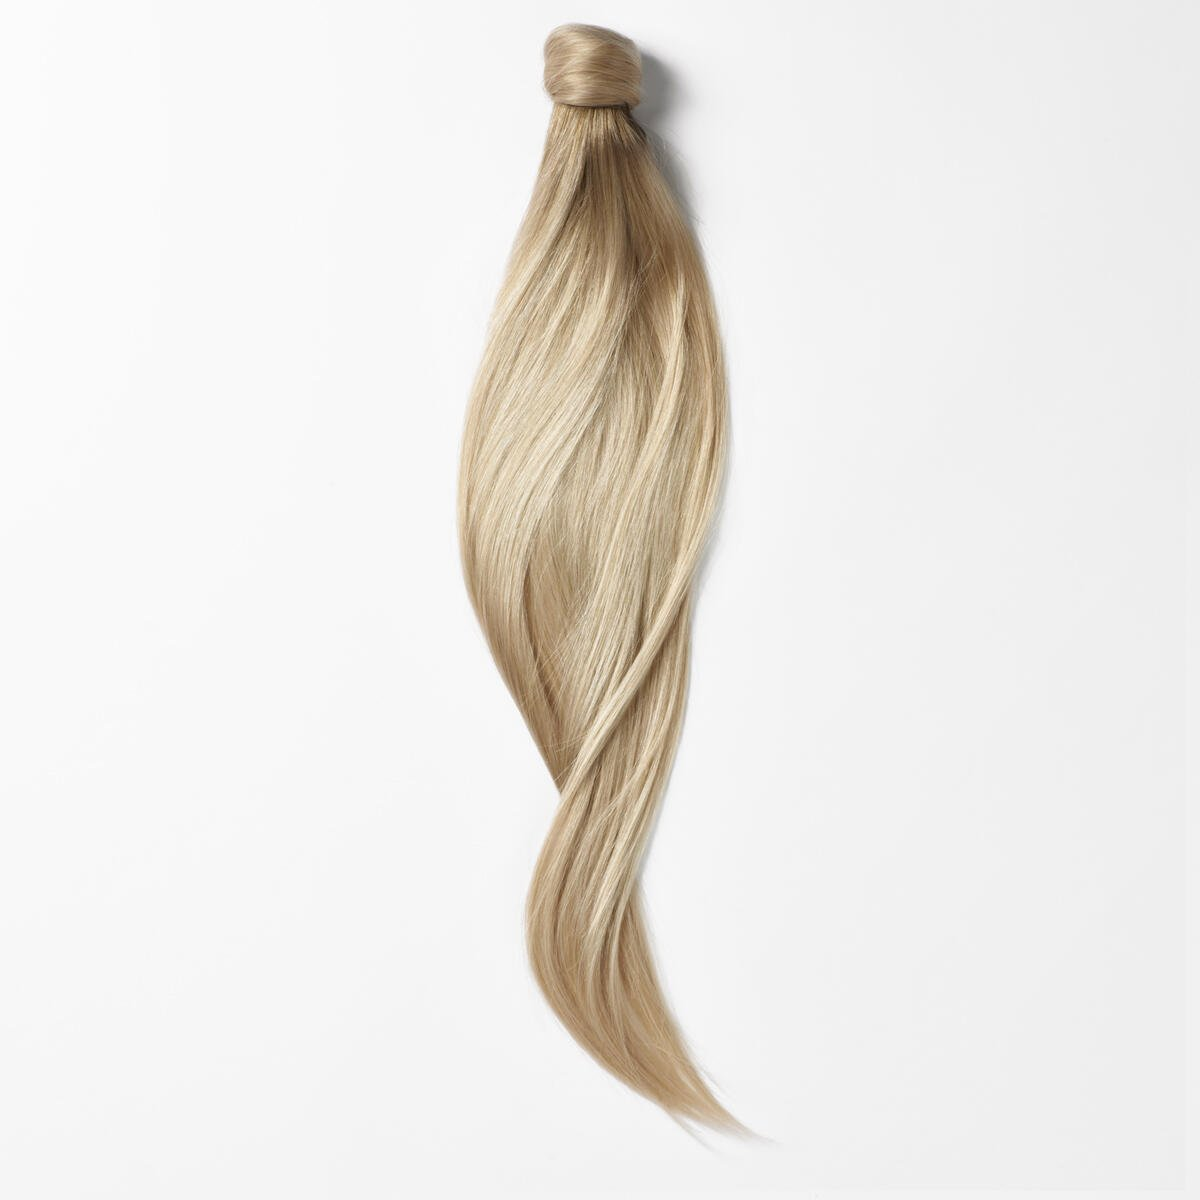 Sleek Clip-in Ponytail Ponytail made of real hair C2.2/10.5 Dark Cool Blonde ColorMelt 40 cm